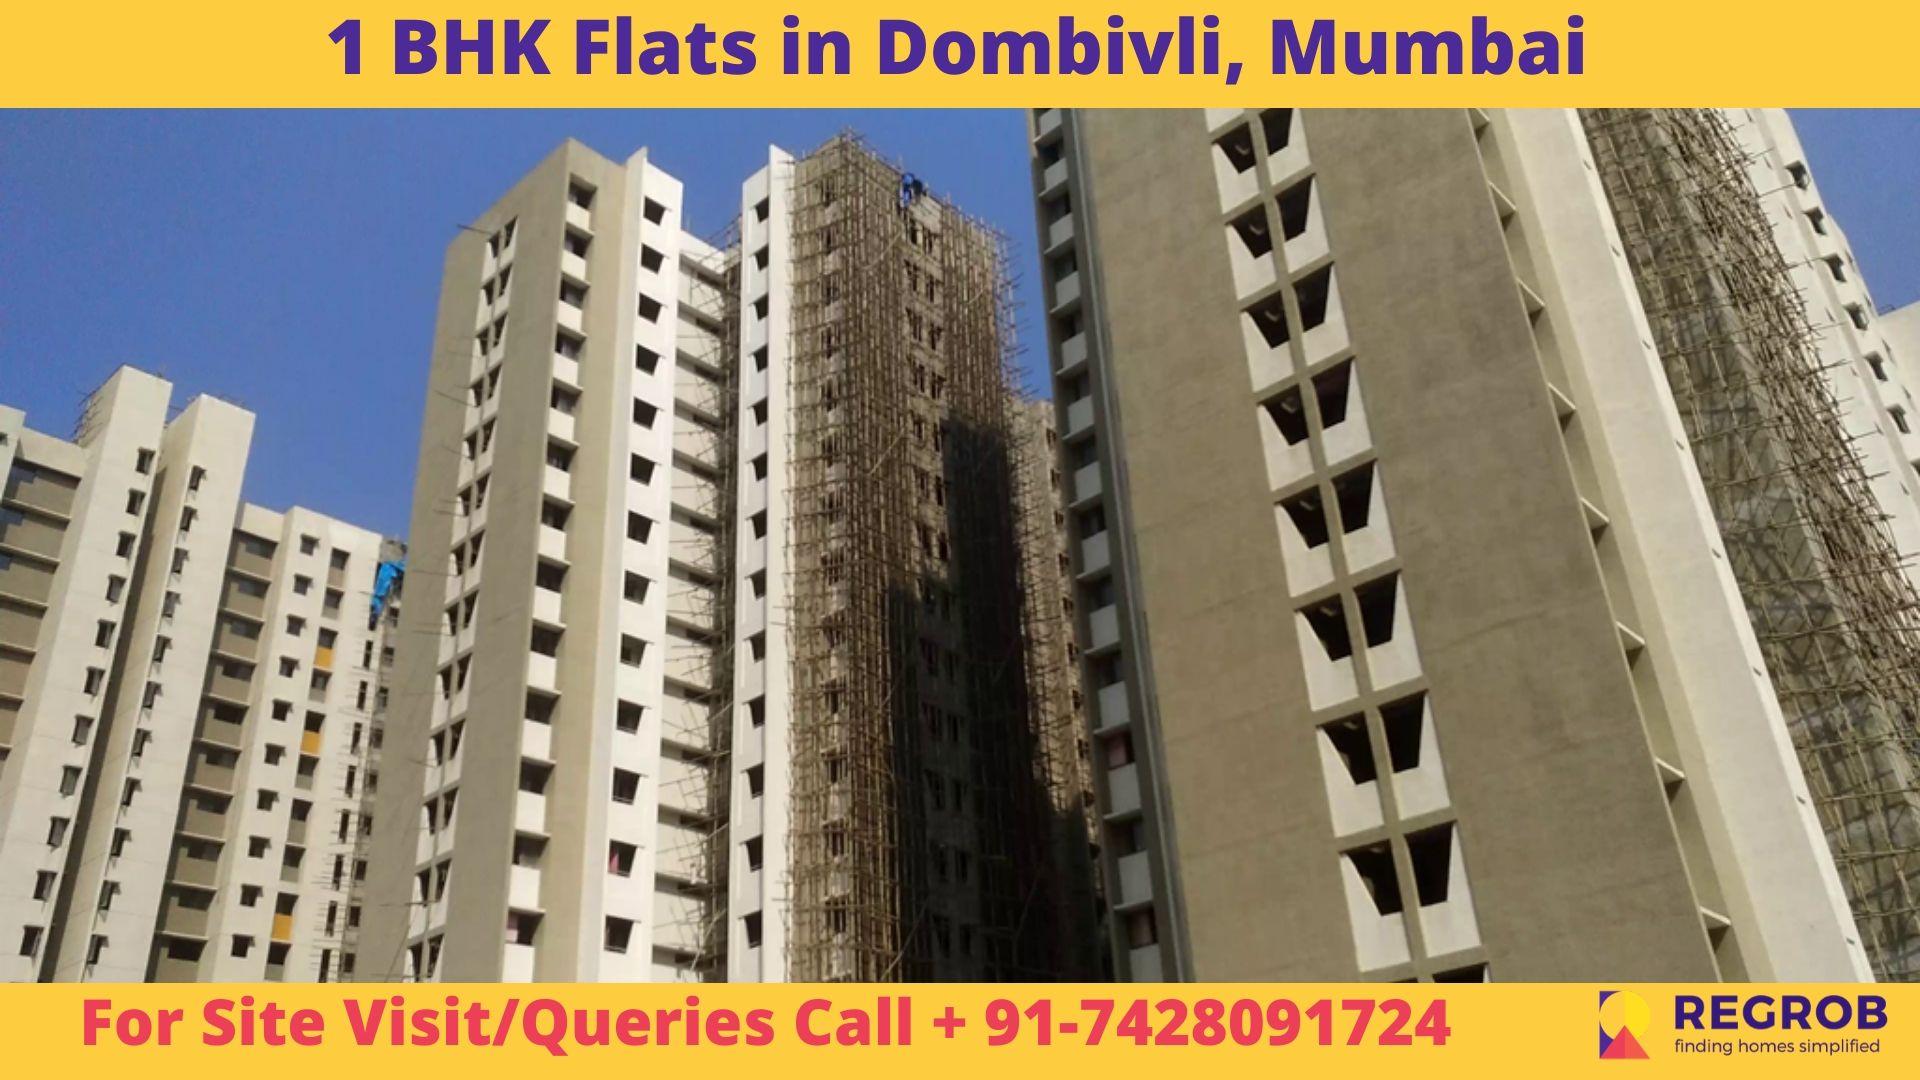 1 BHK Flats in Dombivli, Mumbai